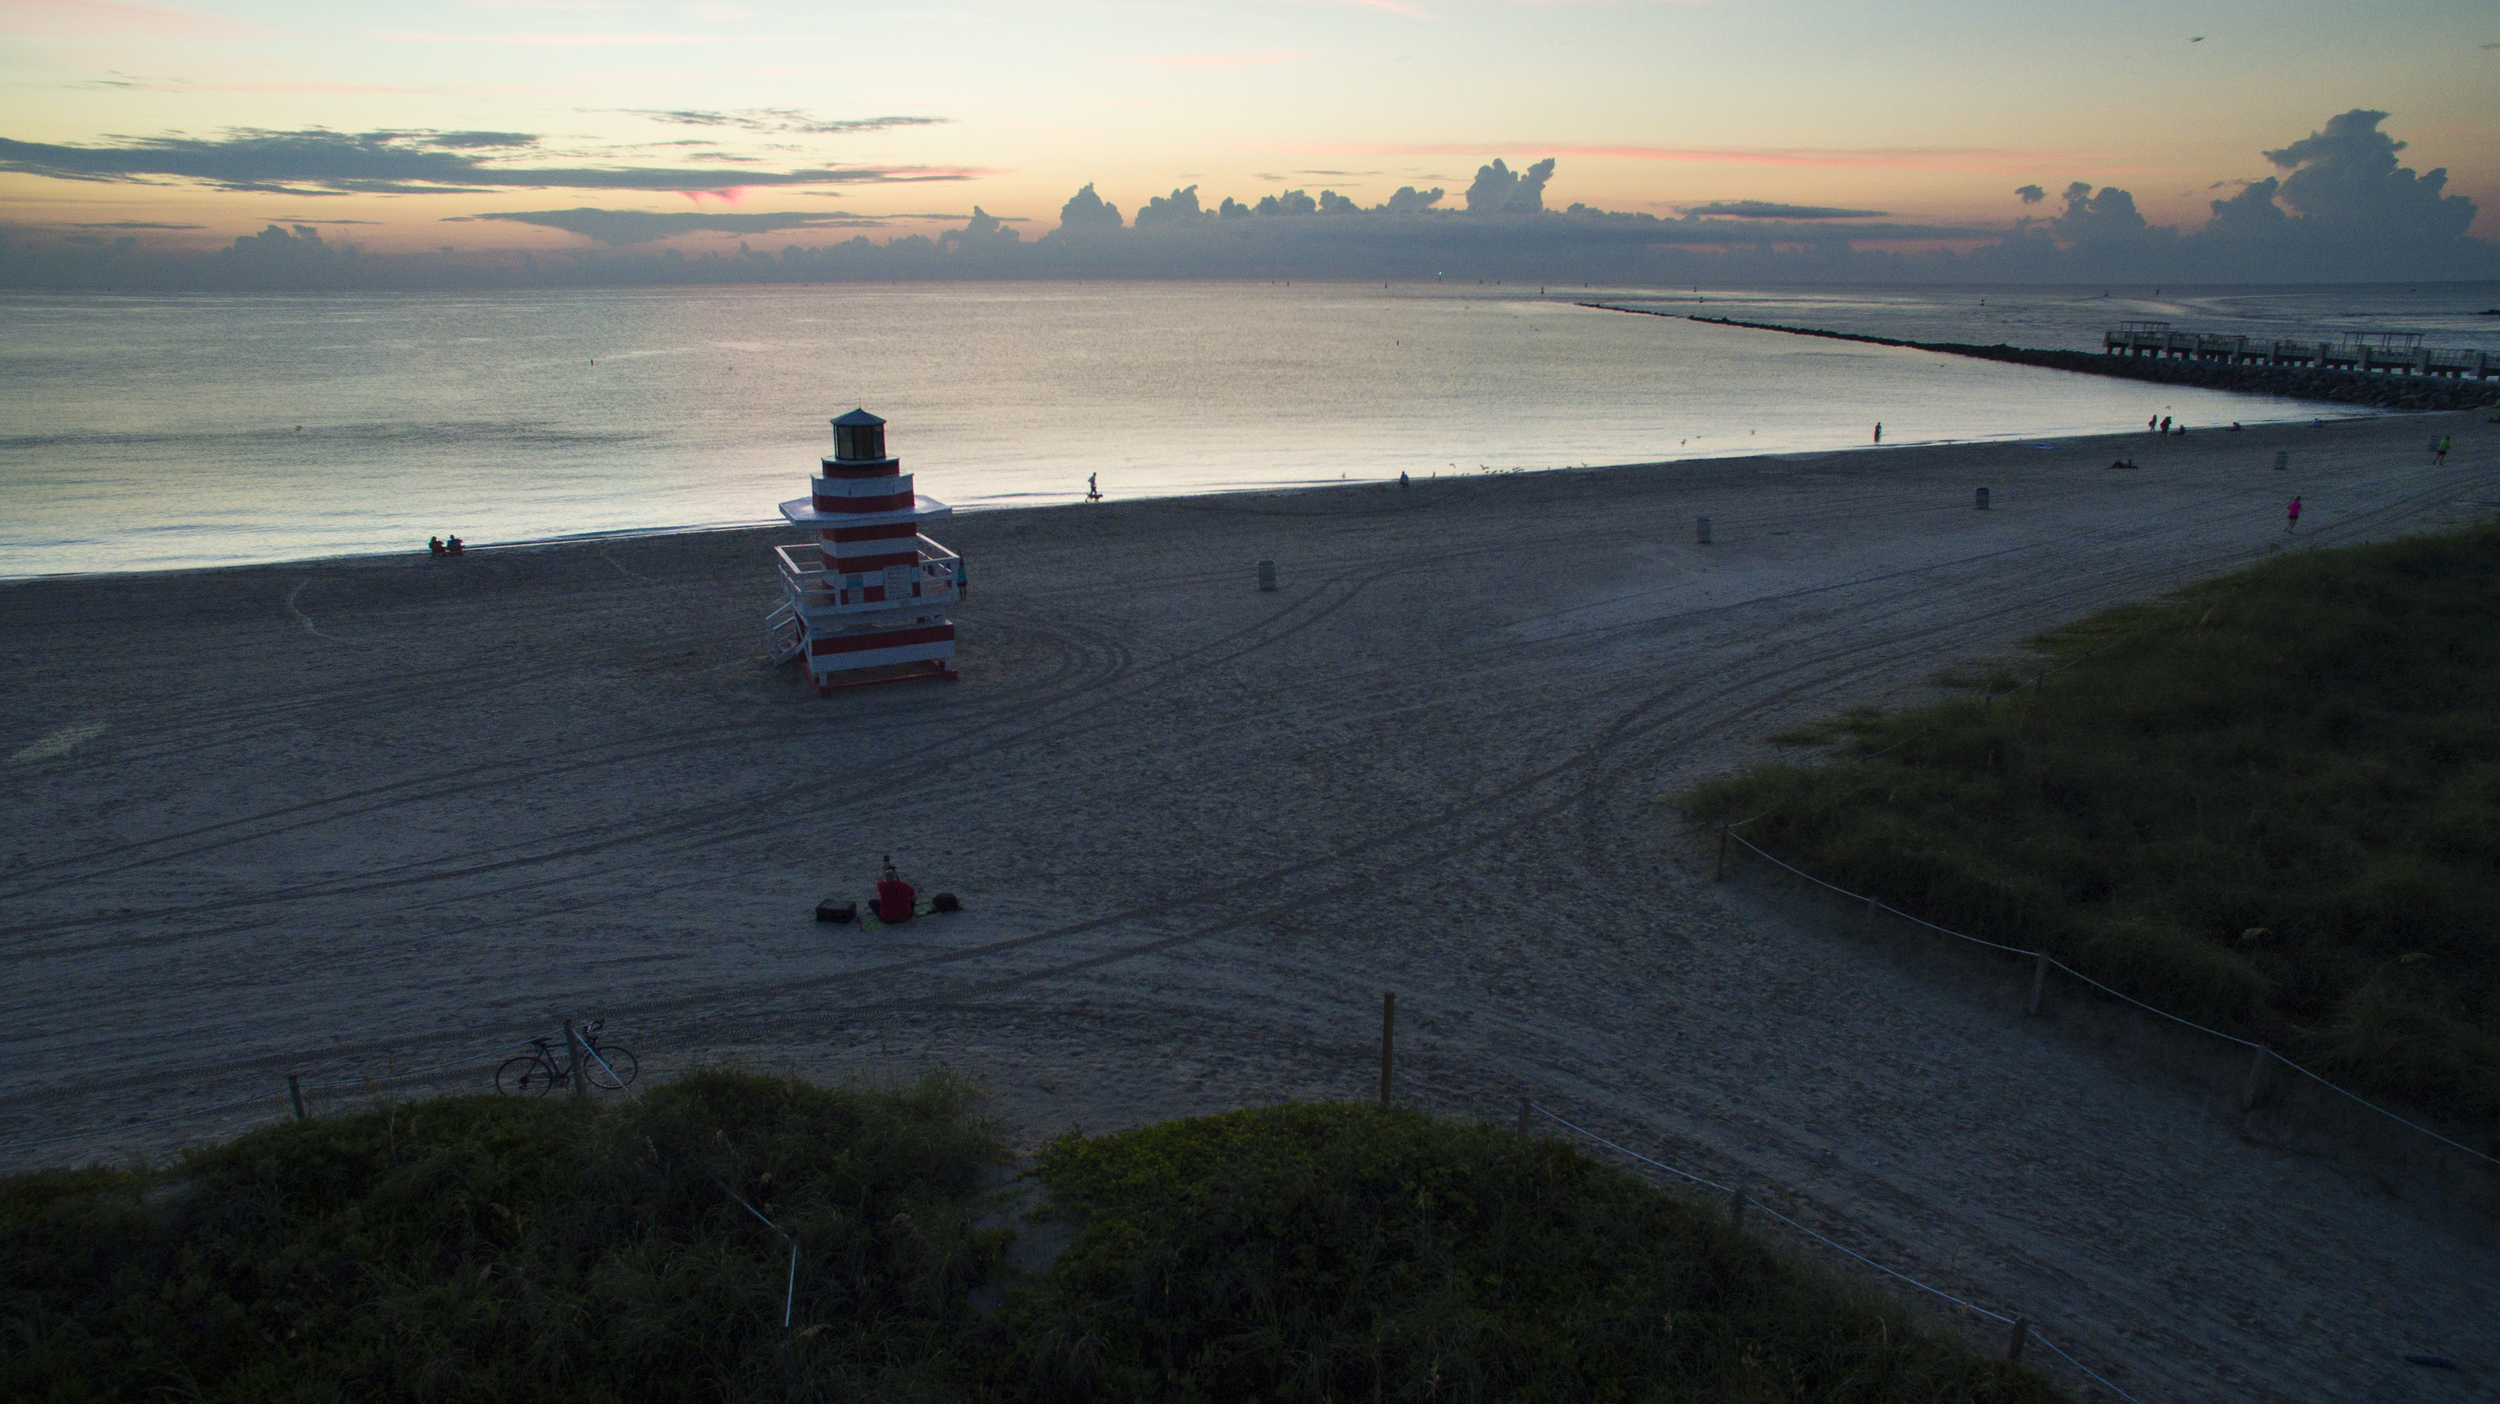 Making a Landscape photo on Miami Beach.